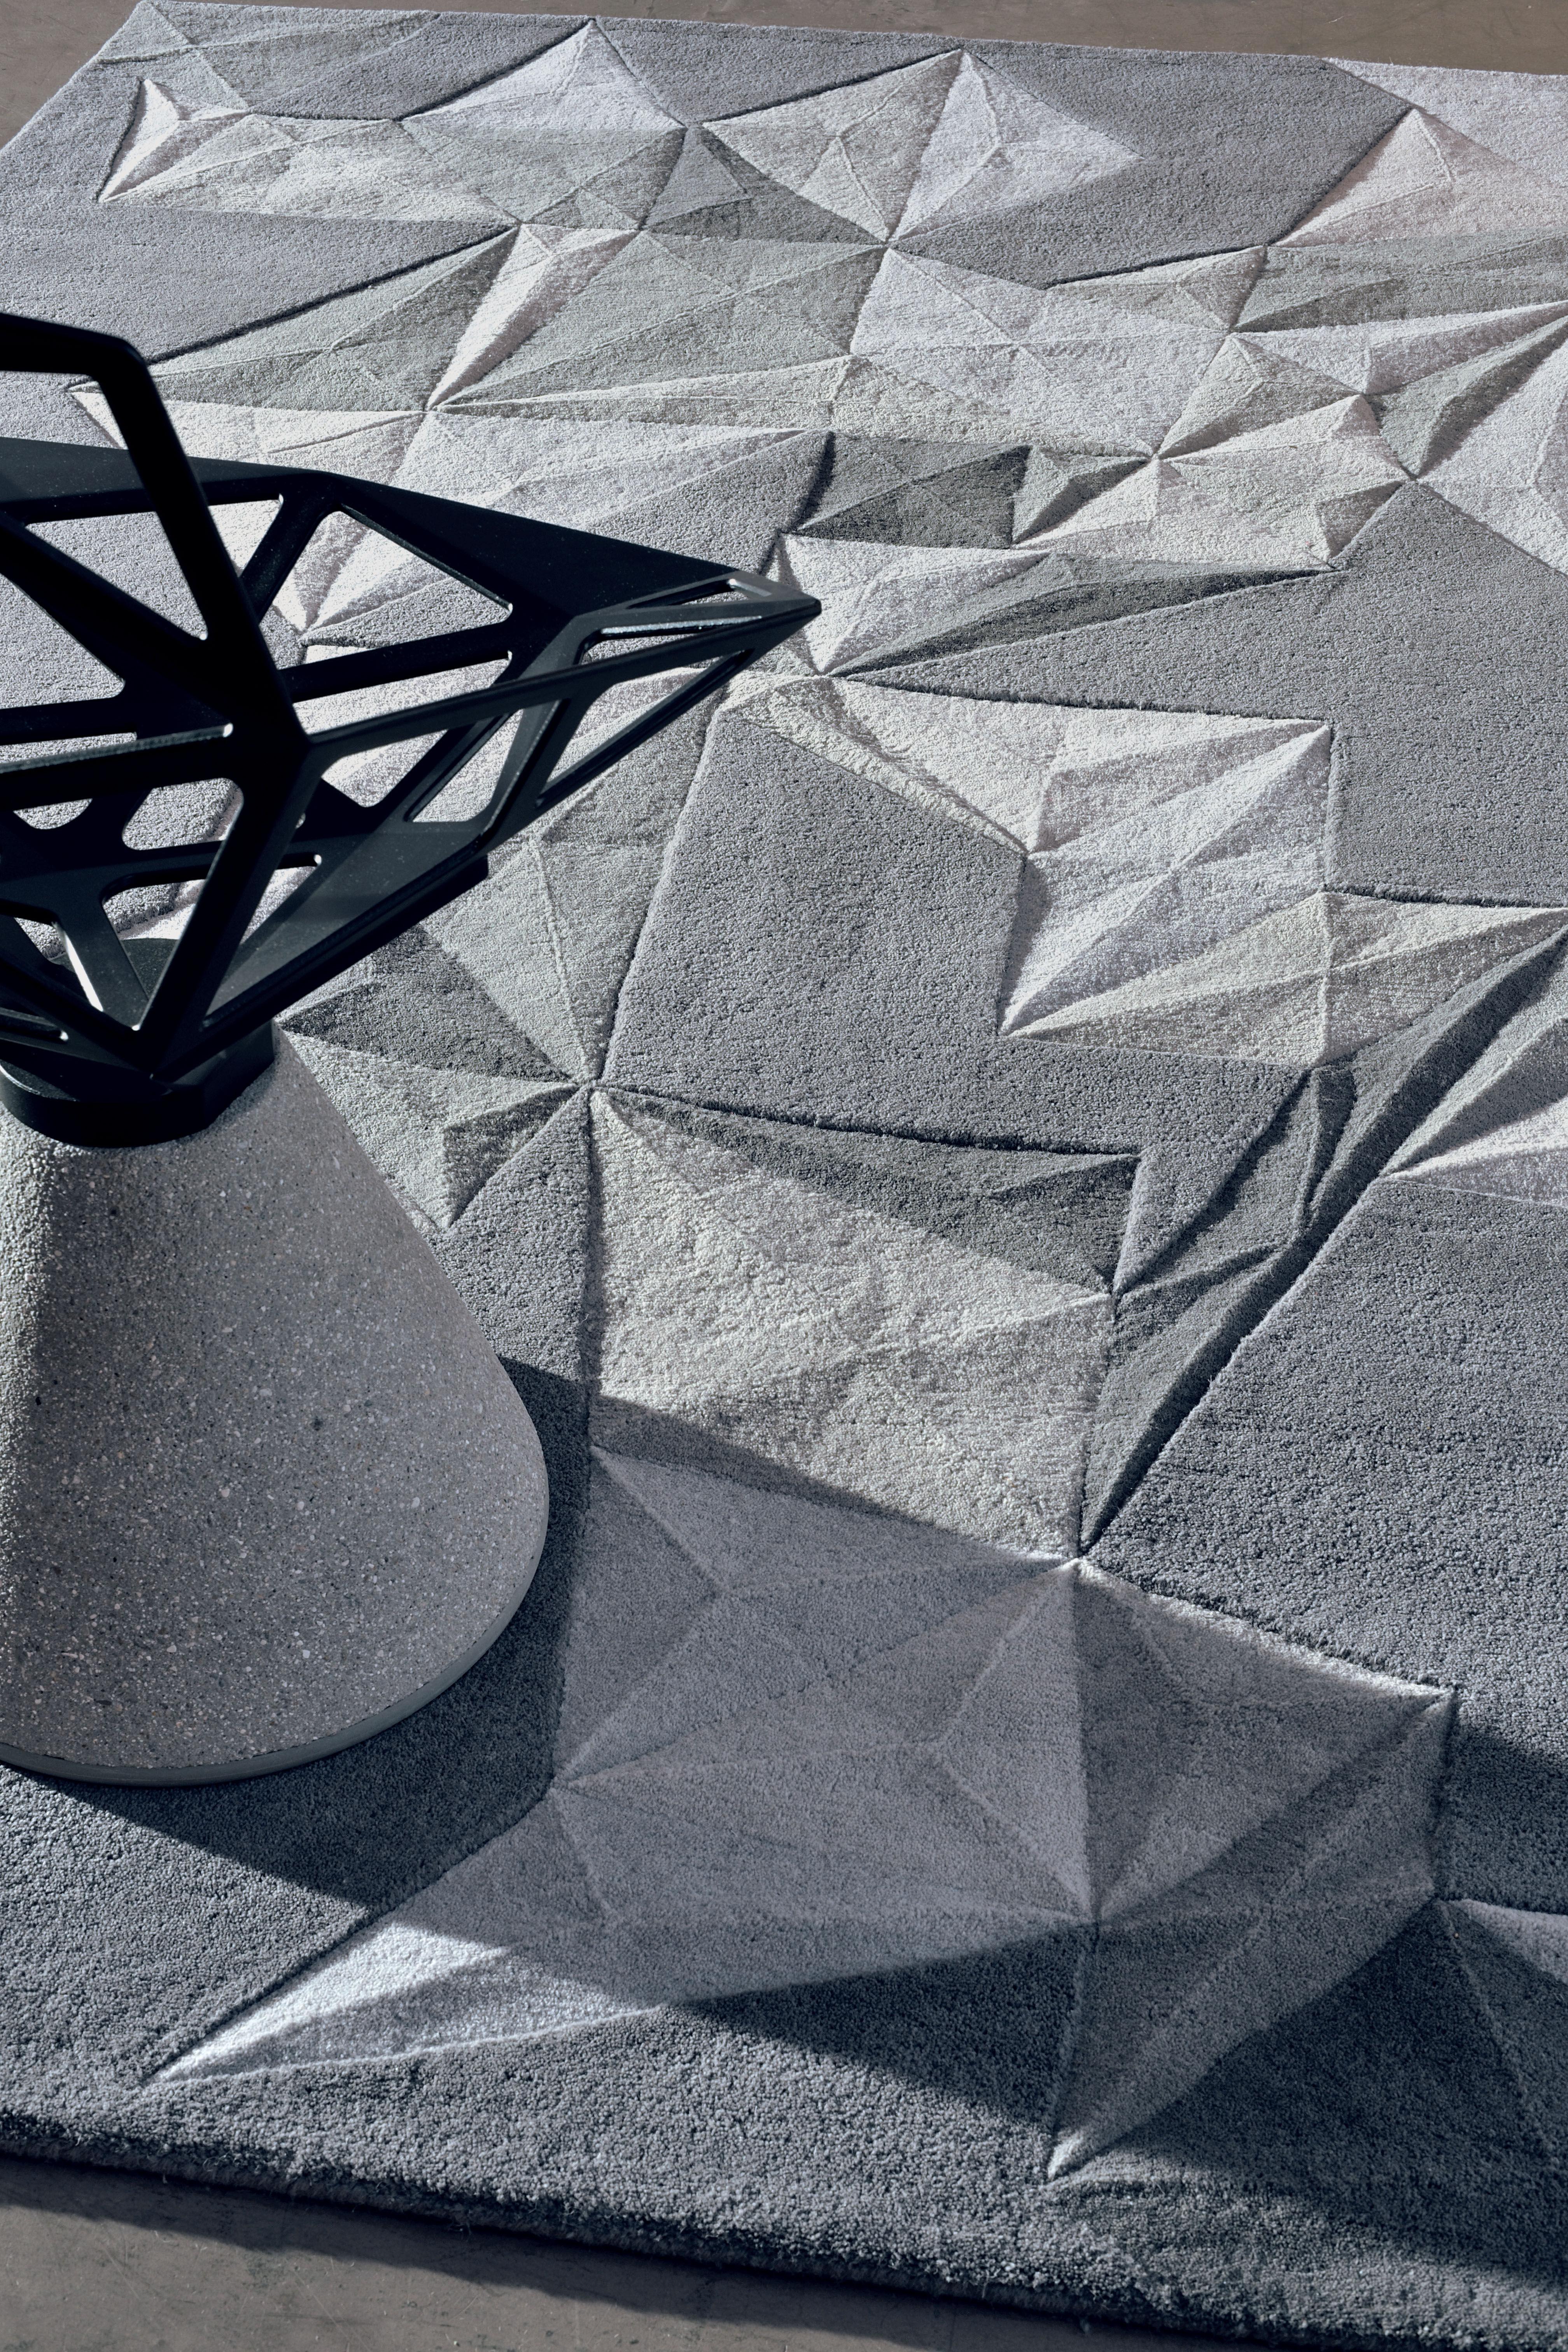 Tapis pliages toulemonde bochart gris made in design - Tapis toulemonde bochart soldes ...